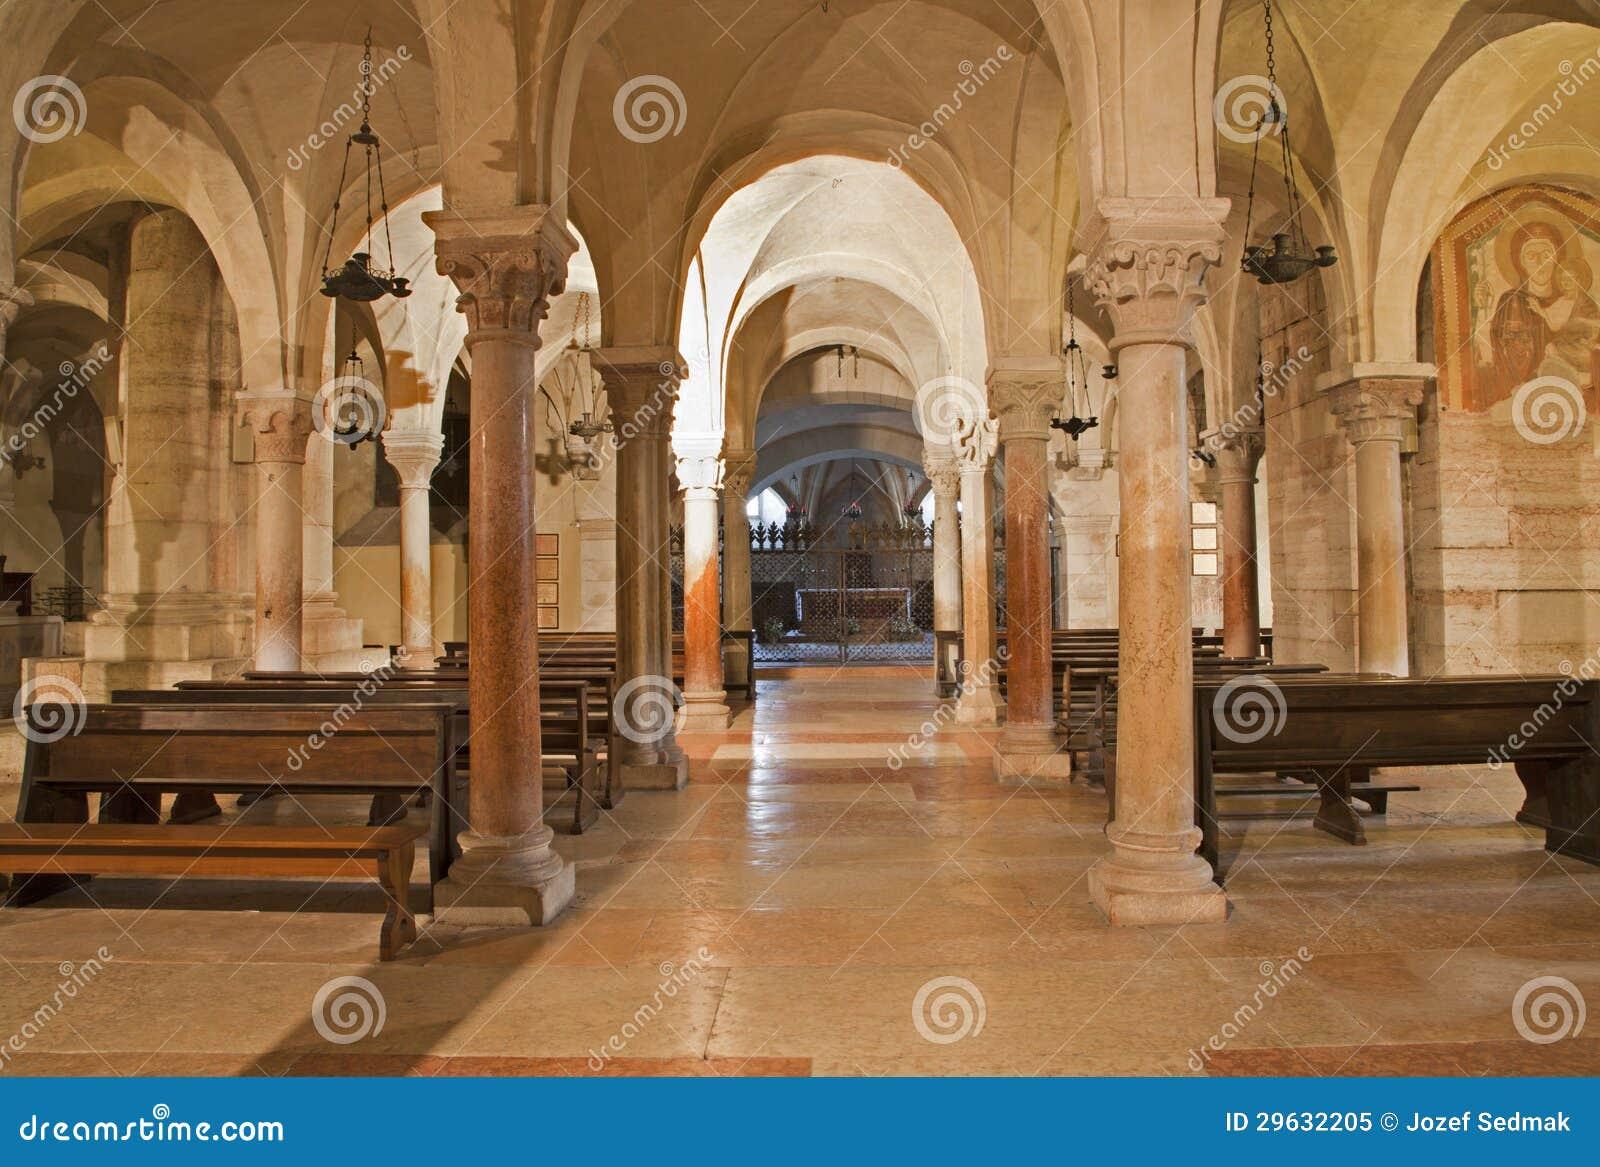 Верона - более низкая церковь romanesque в базилике Сан Zeno